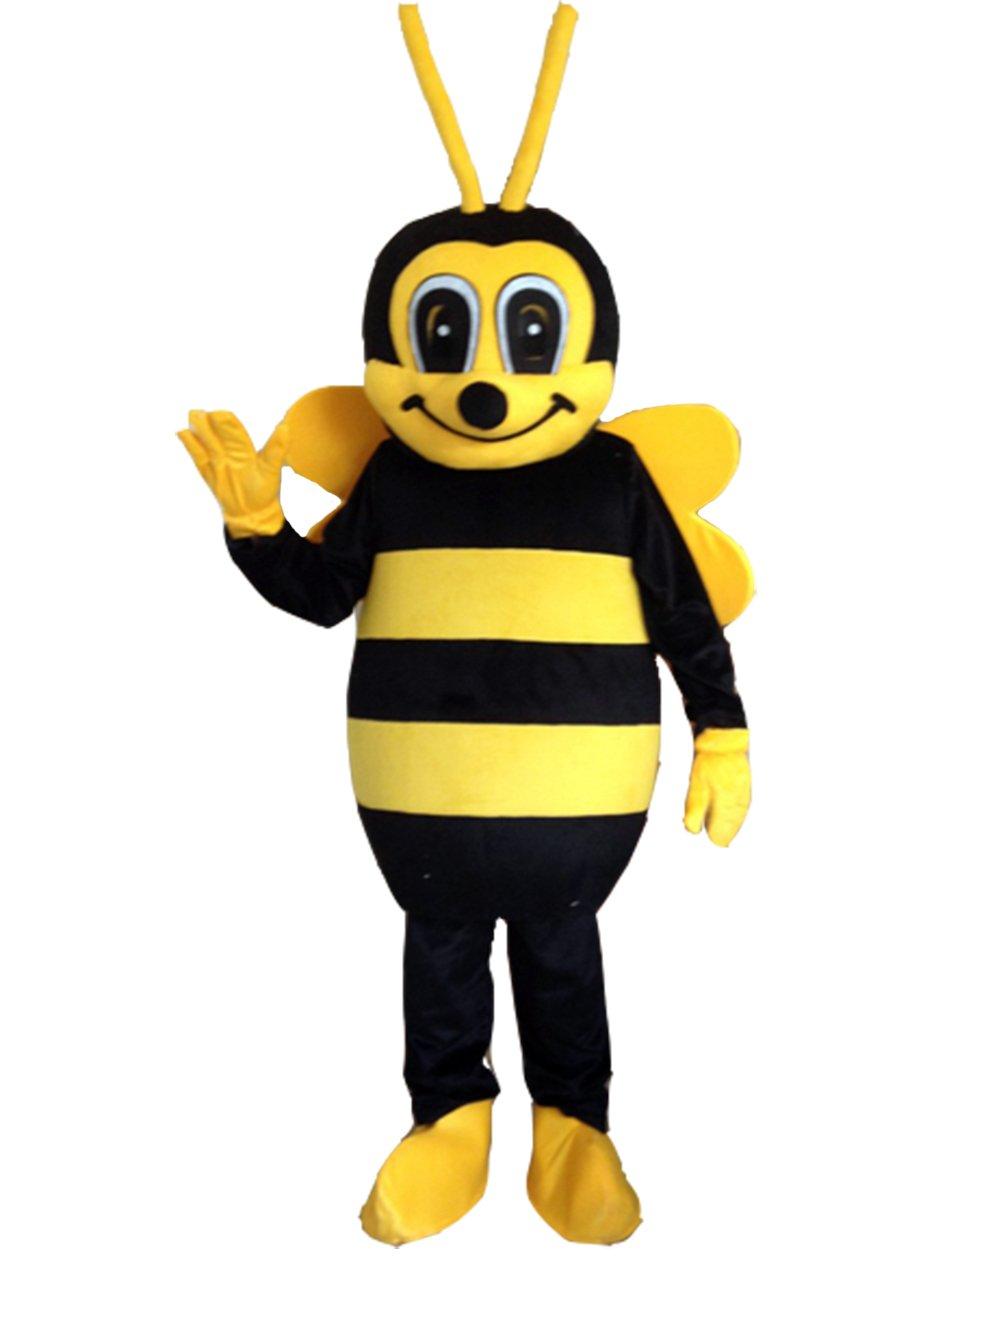 Bee Mascot Costume Bee Costume Adult Halloween Fancy Dress (XX-Large)